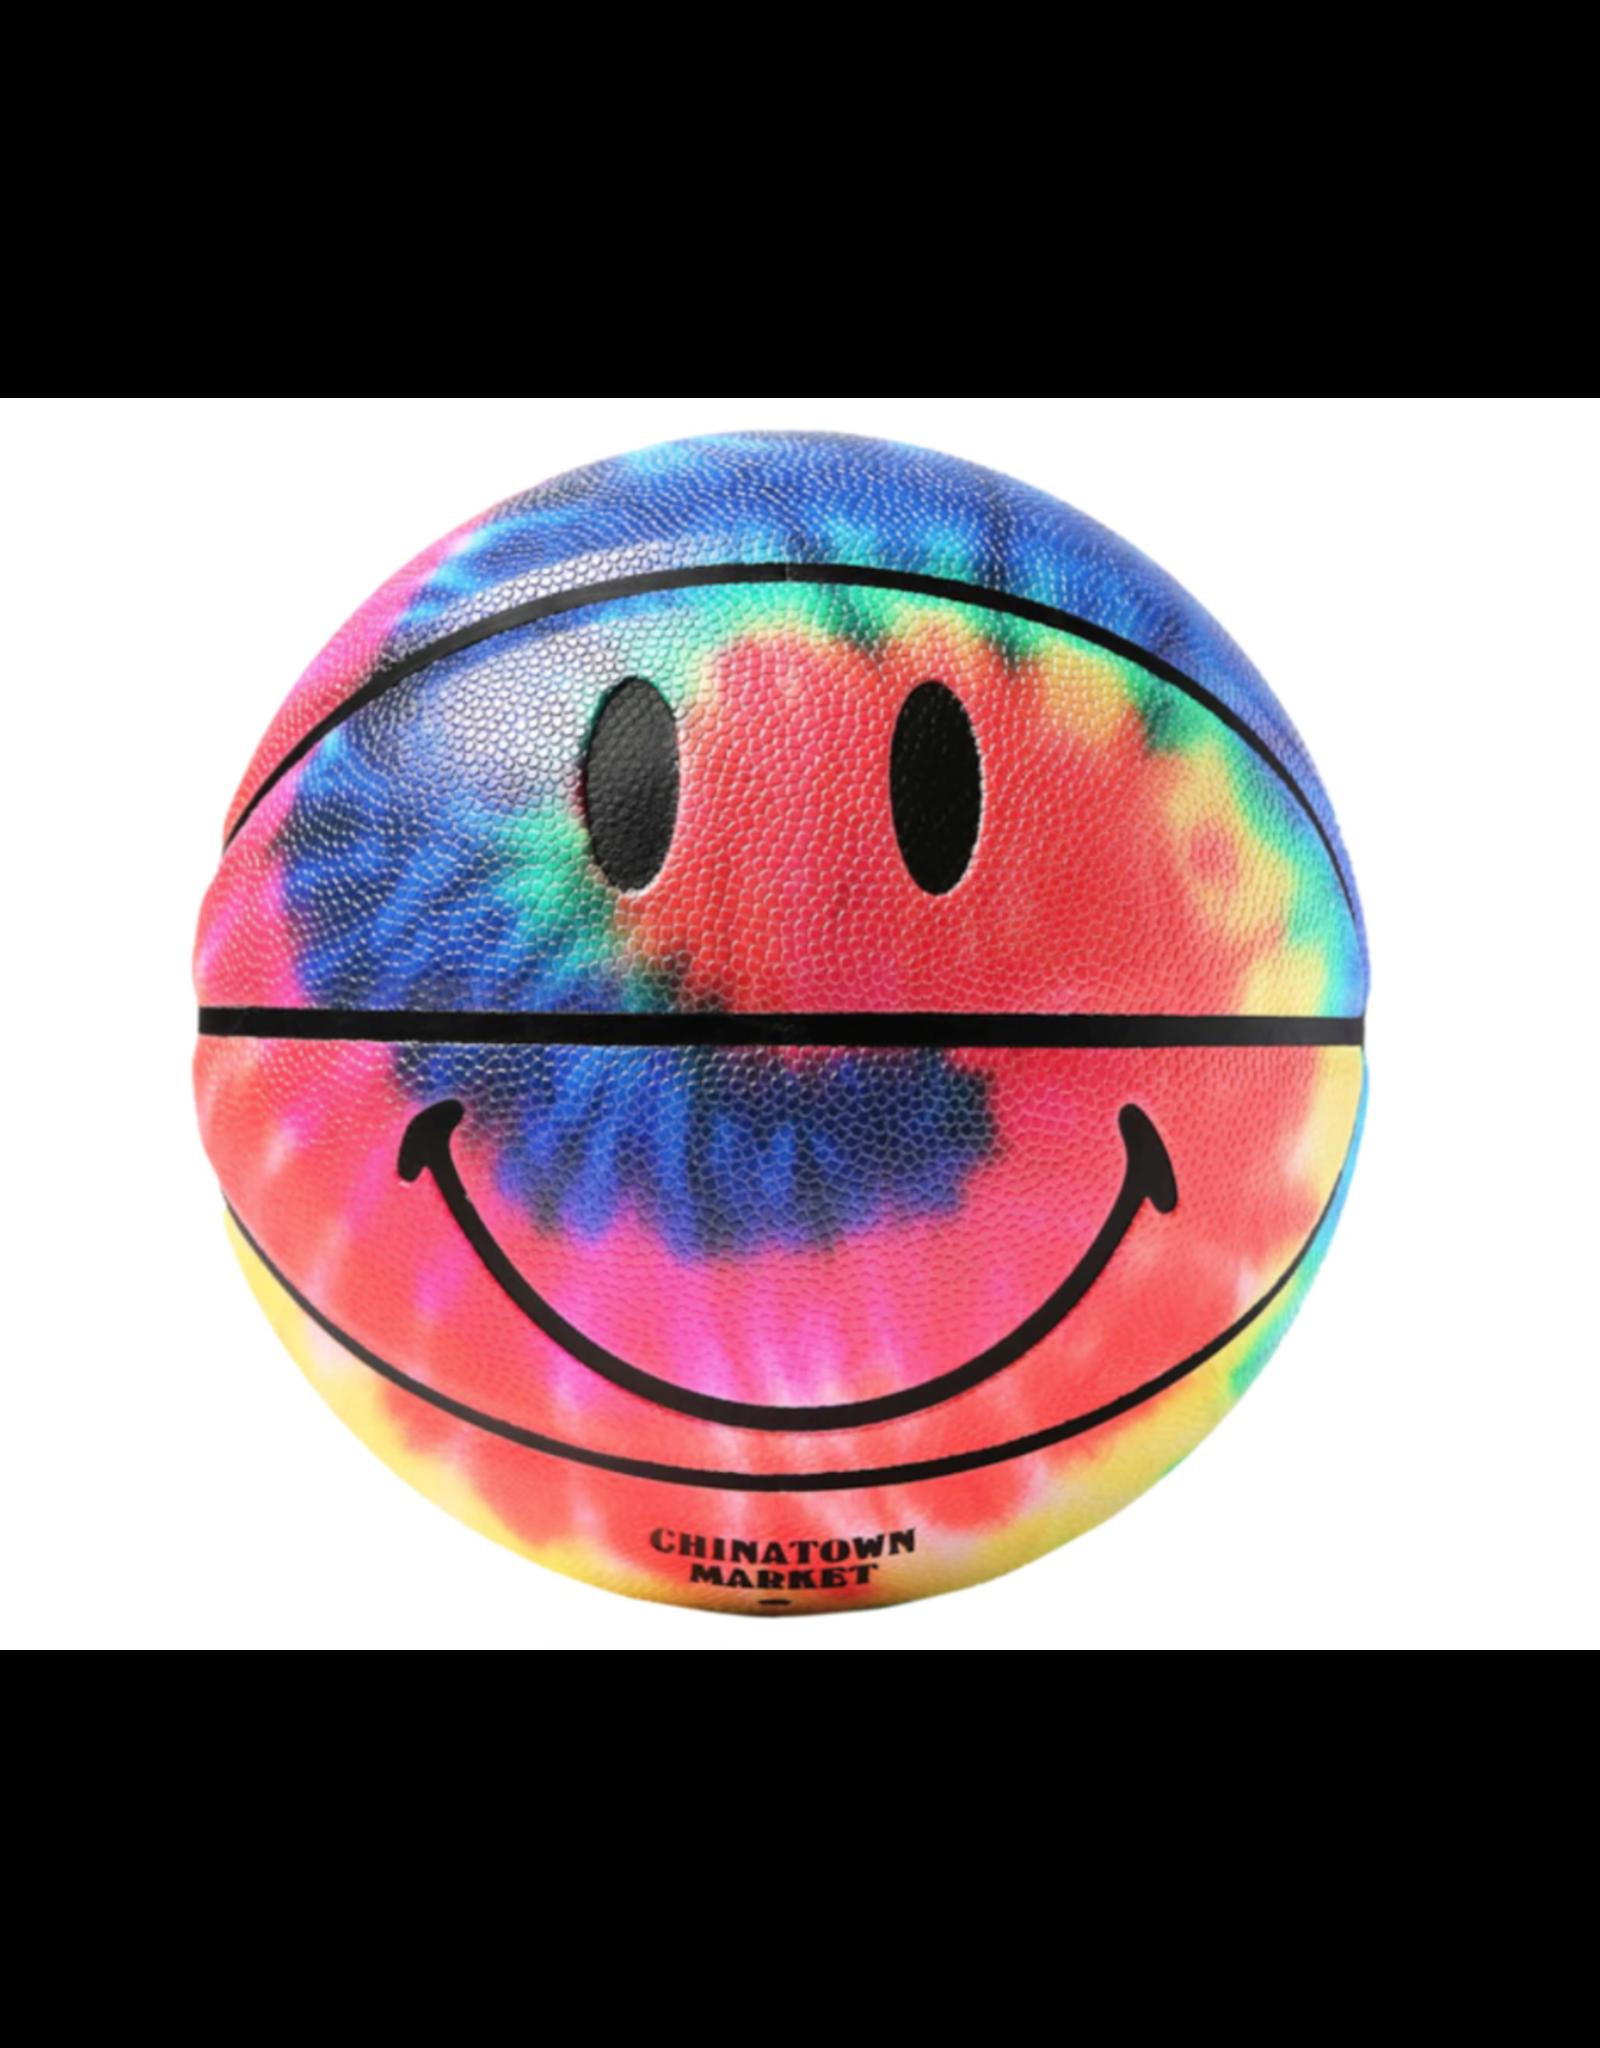 Chinatown Market Smiley Basketball Tie Dye